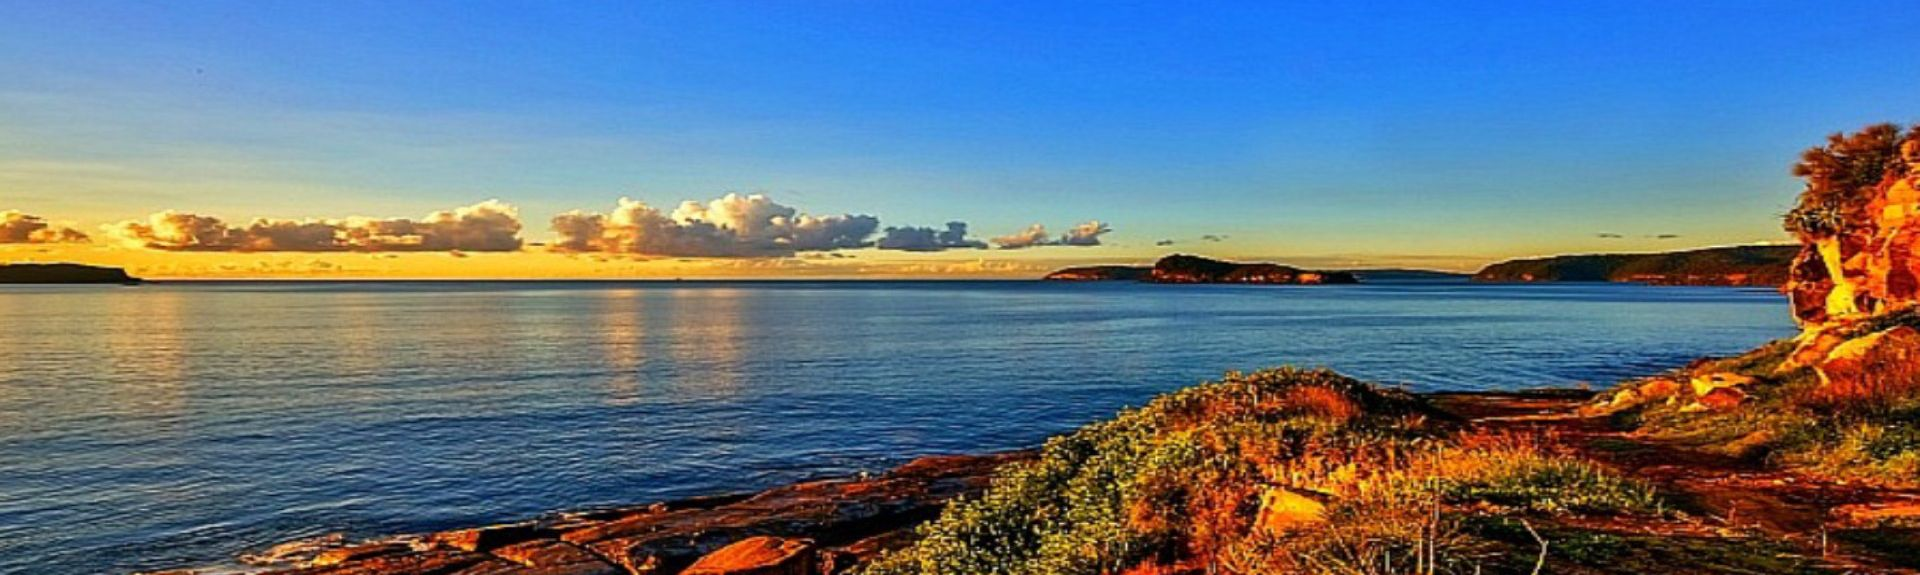 Magenta Shores Beach, Magenta Shores, New South Wales, Australië